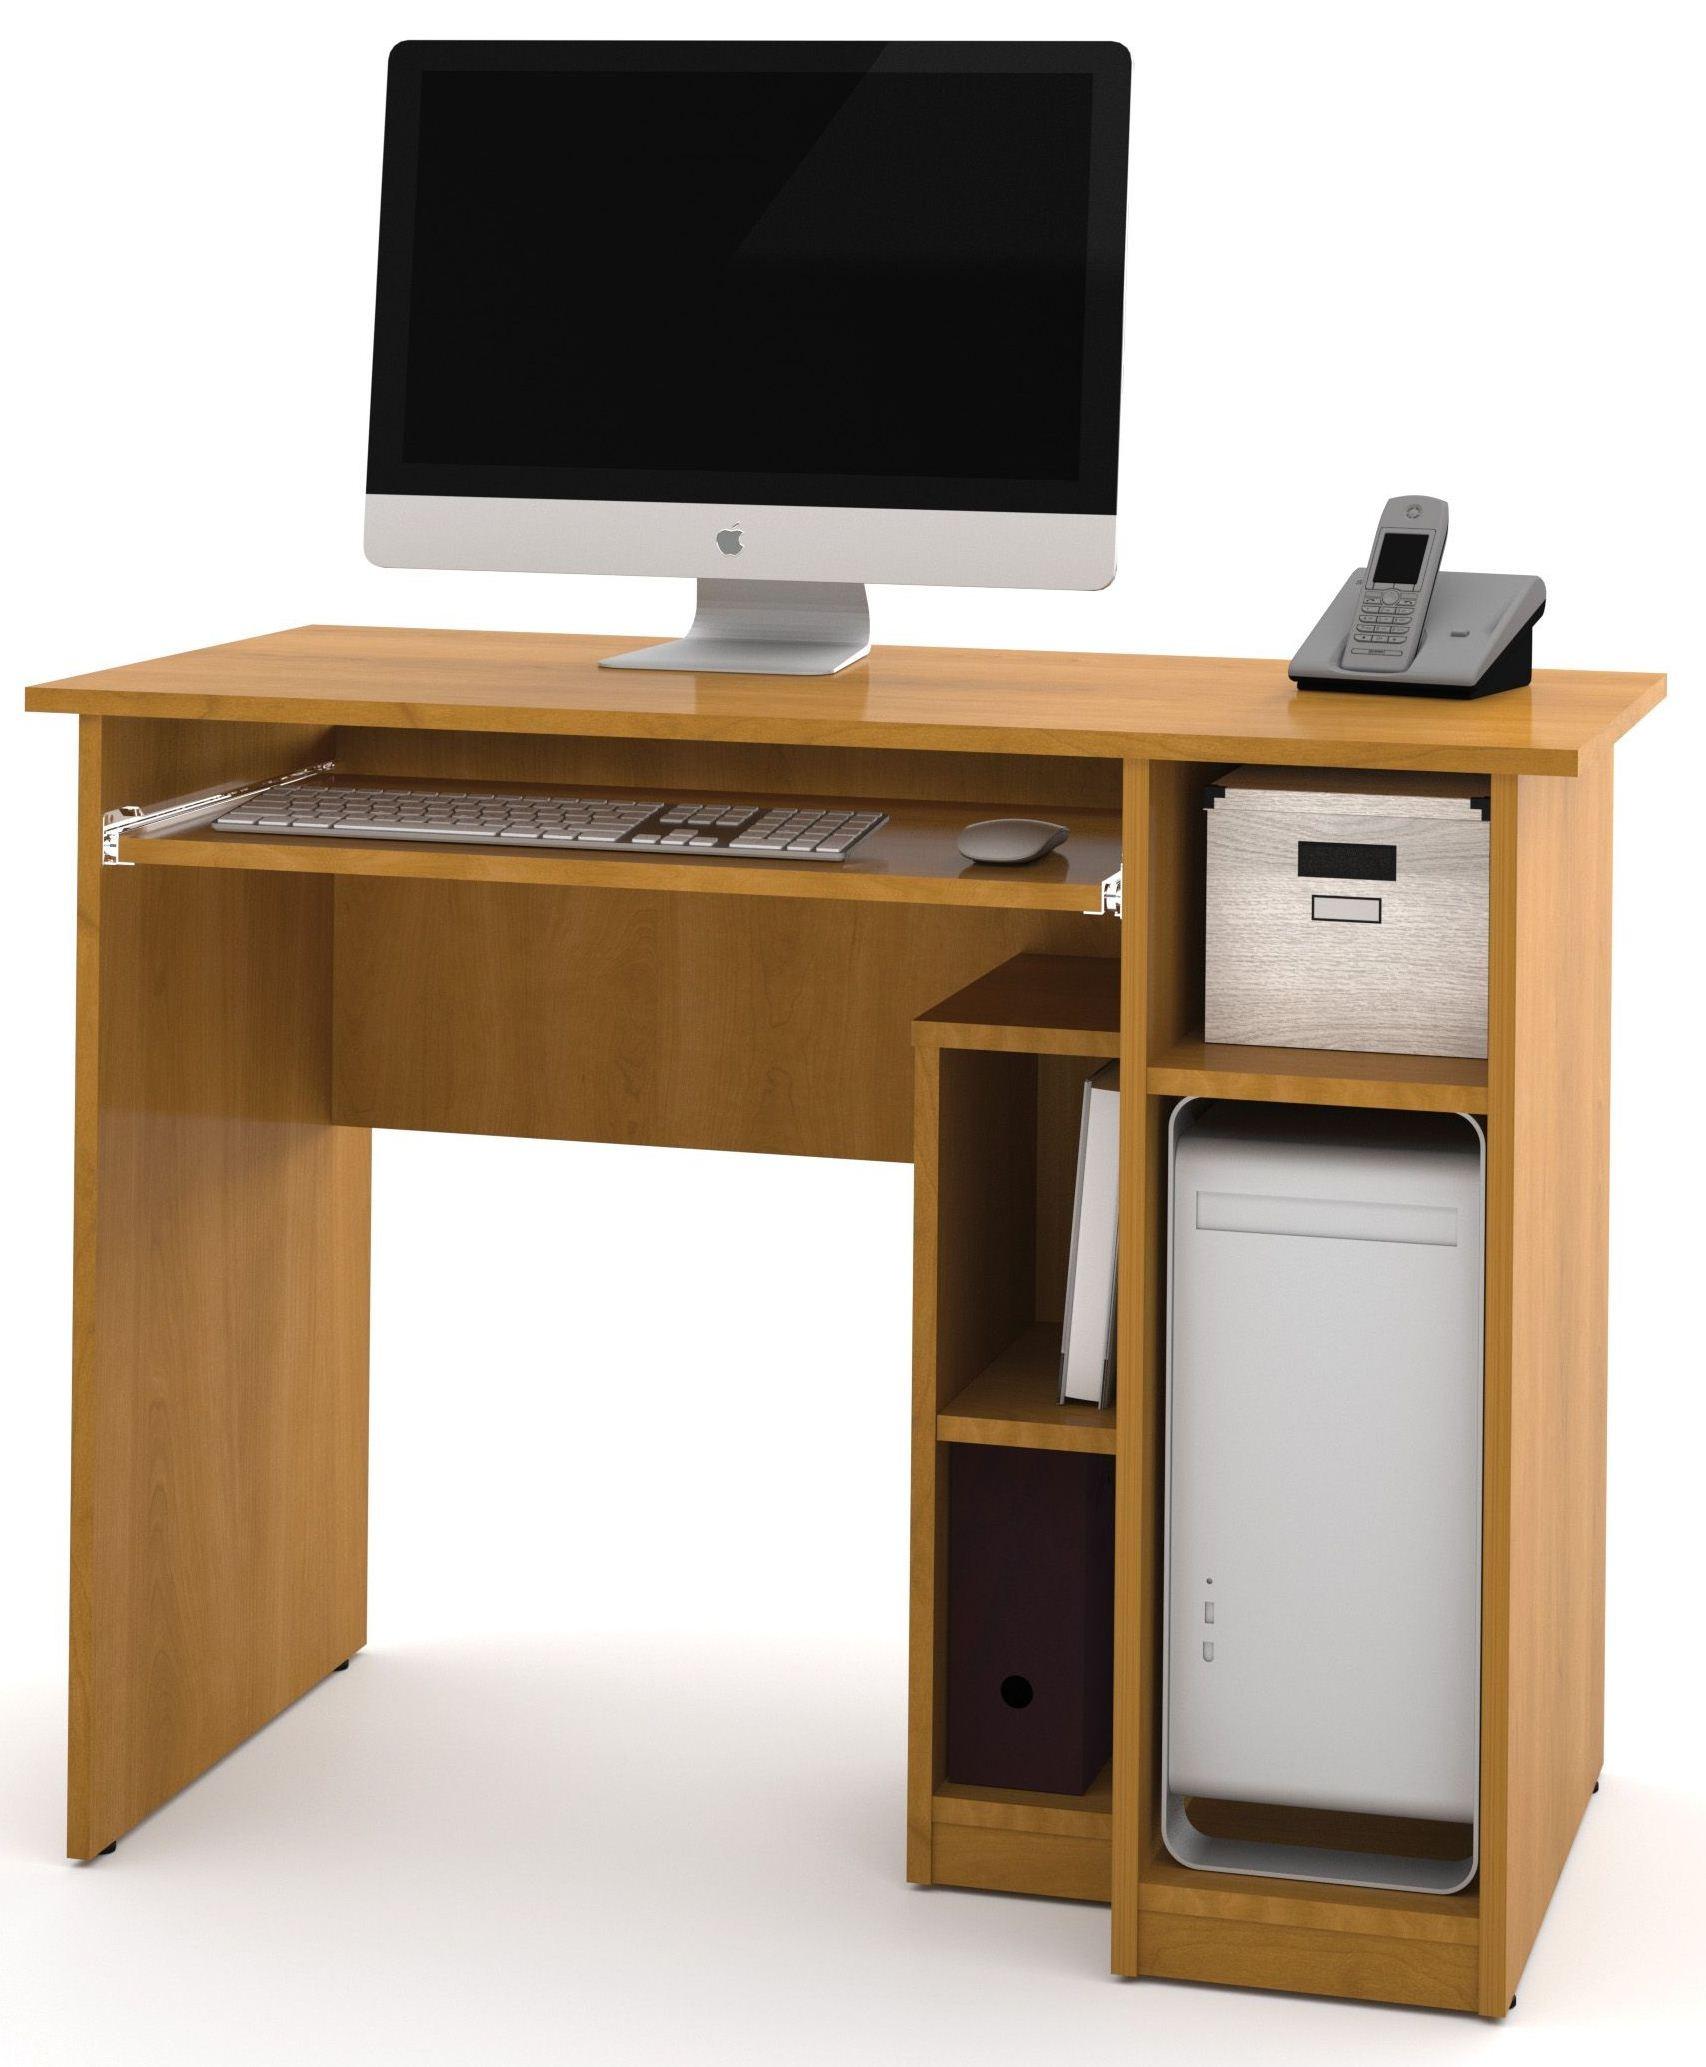 Basic Cappuccino Cherry Computer Desk from Bestar (90400-1168